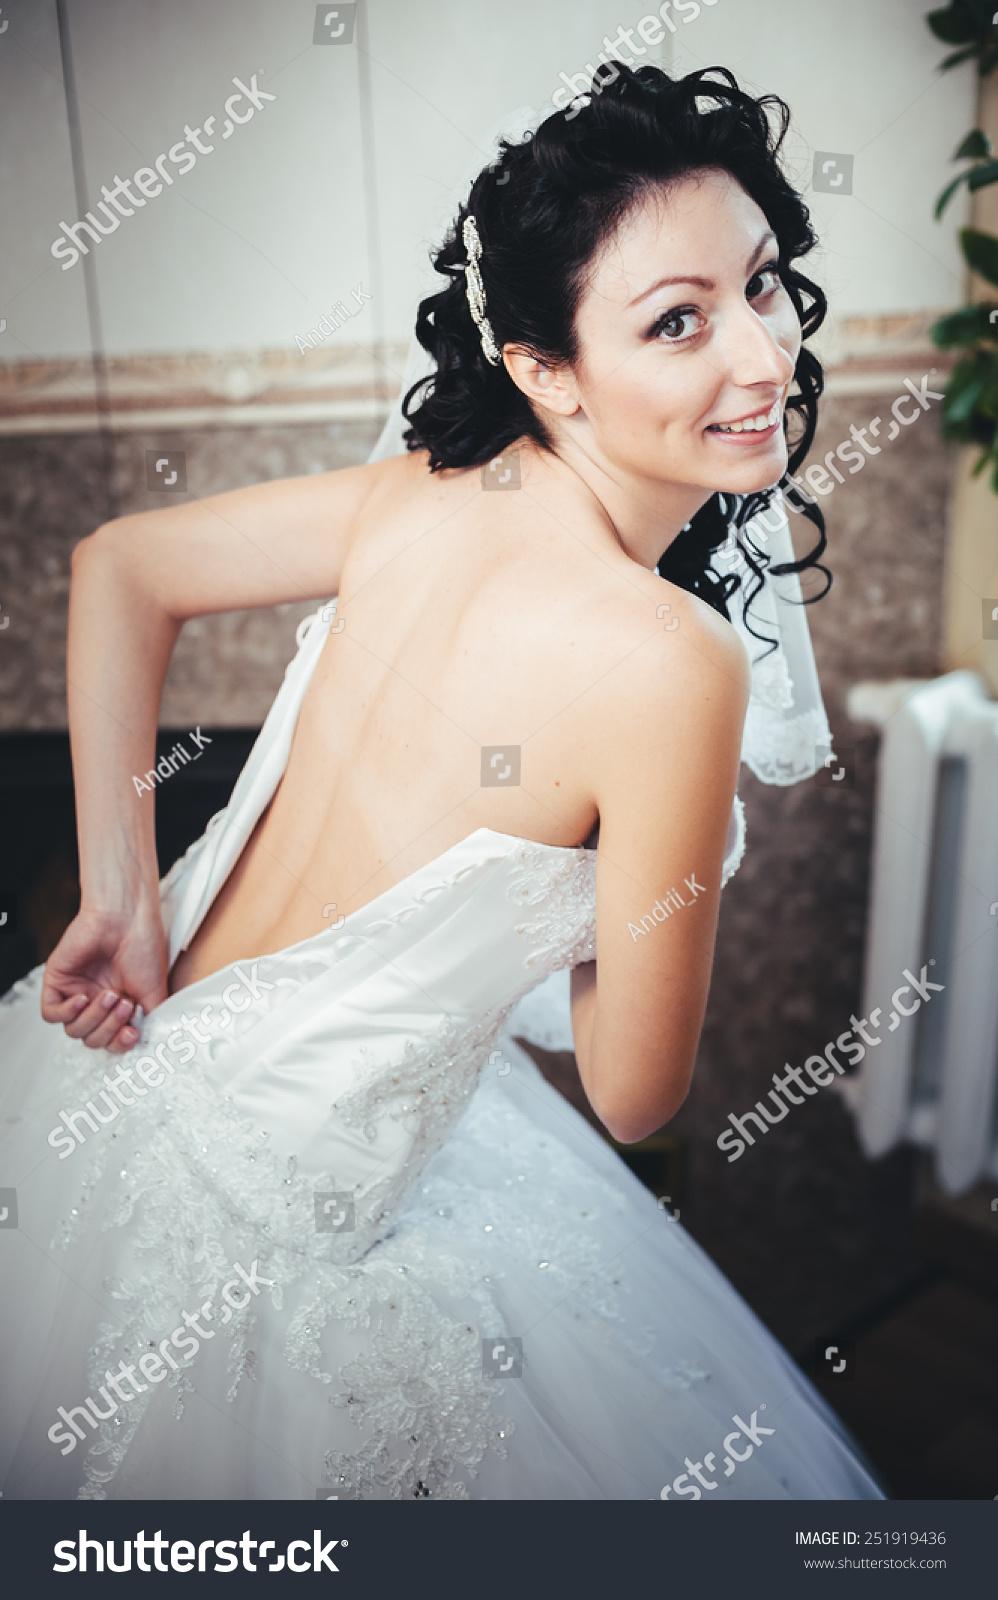 Nude Bride Striptease Beautiful Girl White Stock Photo ...